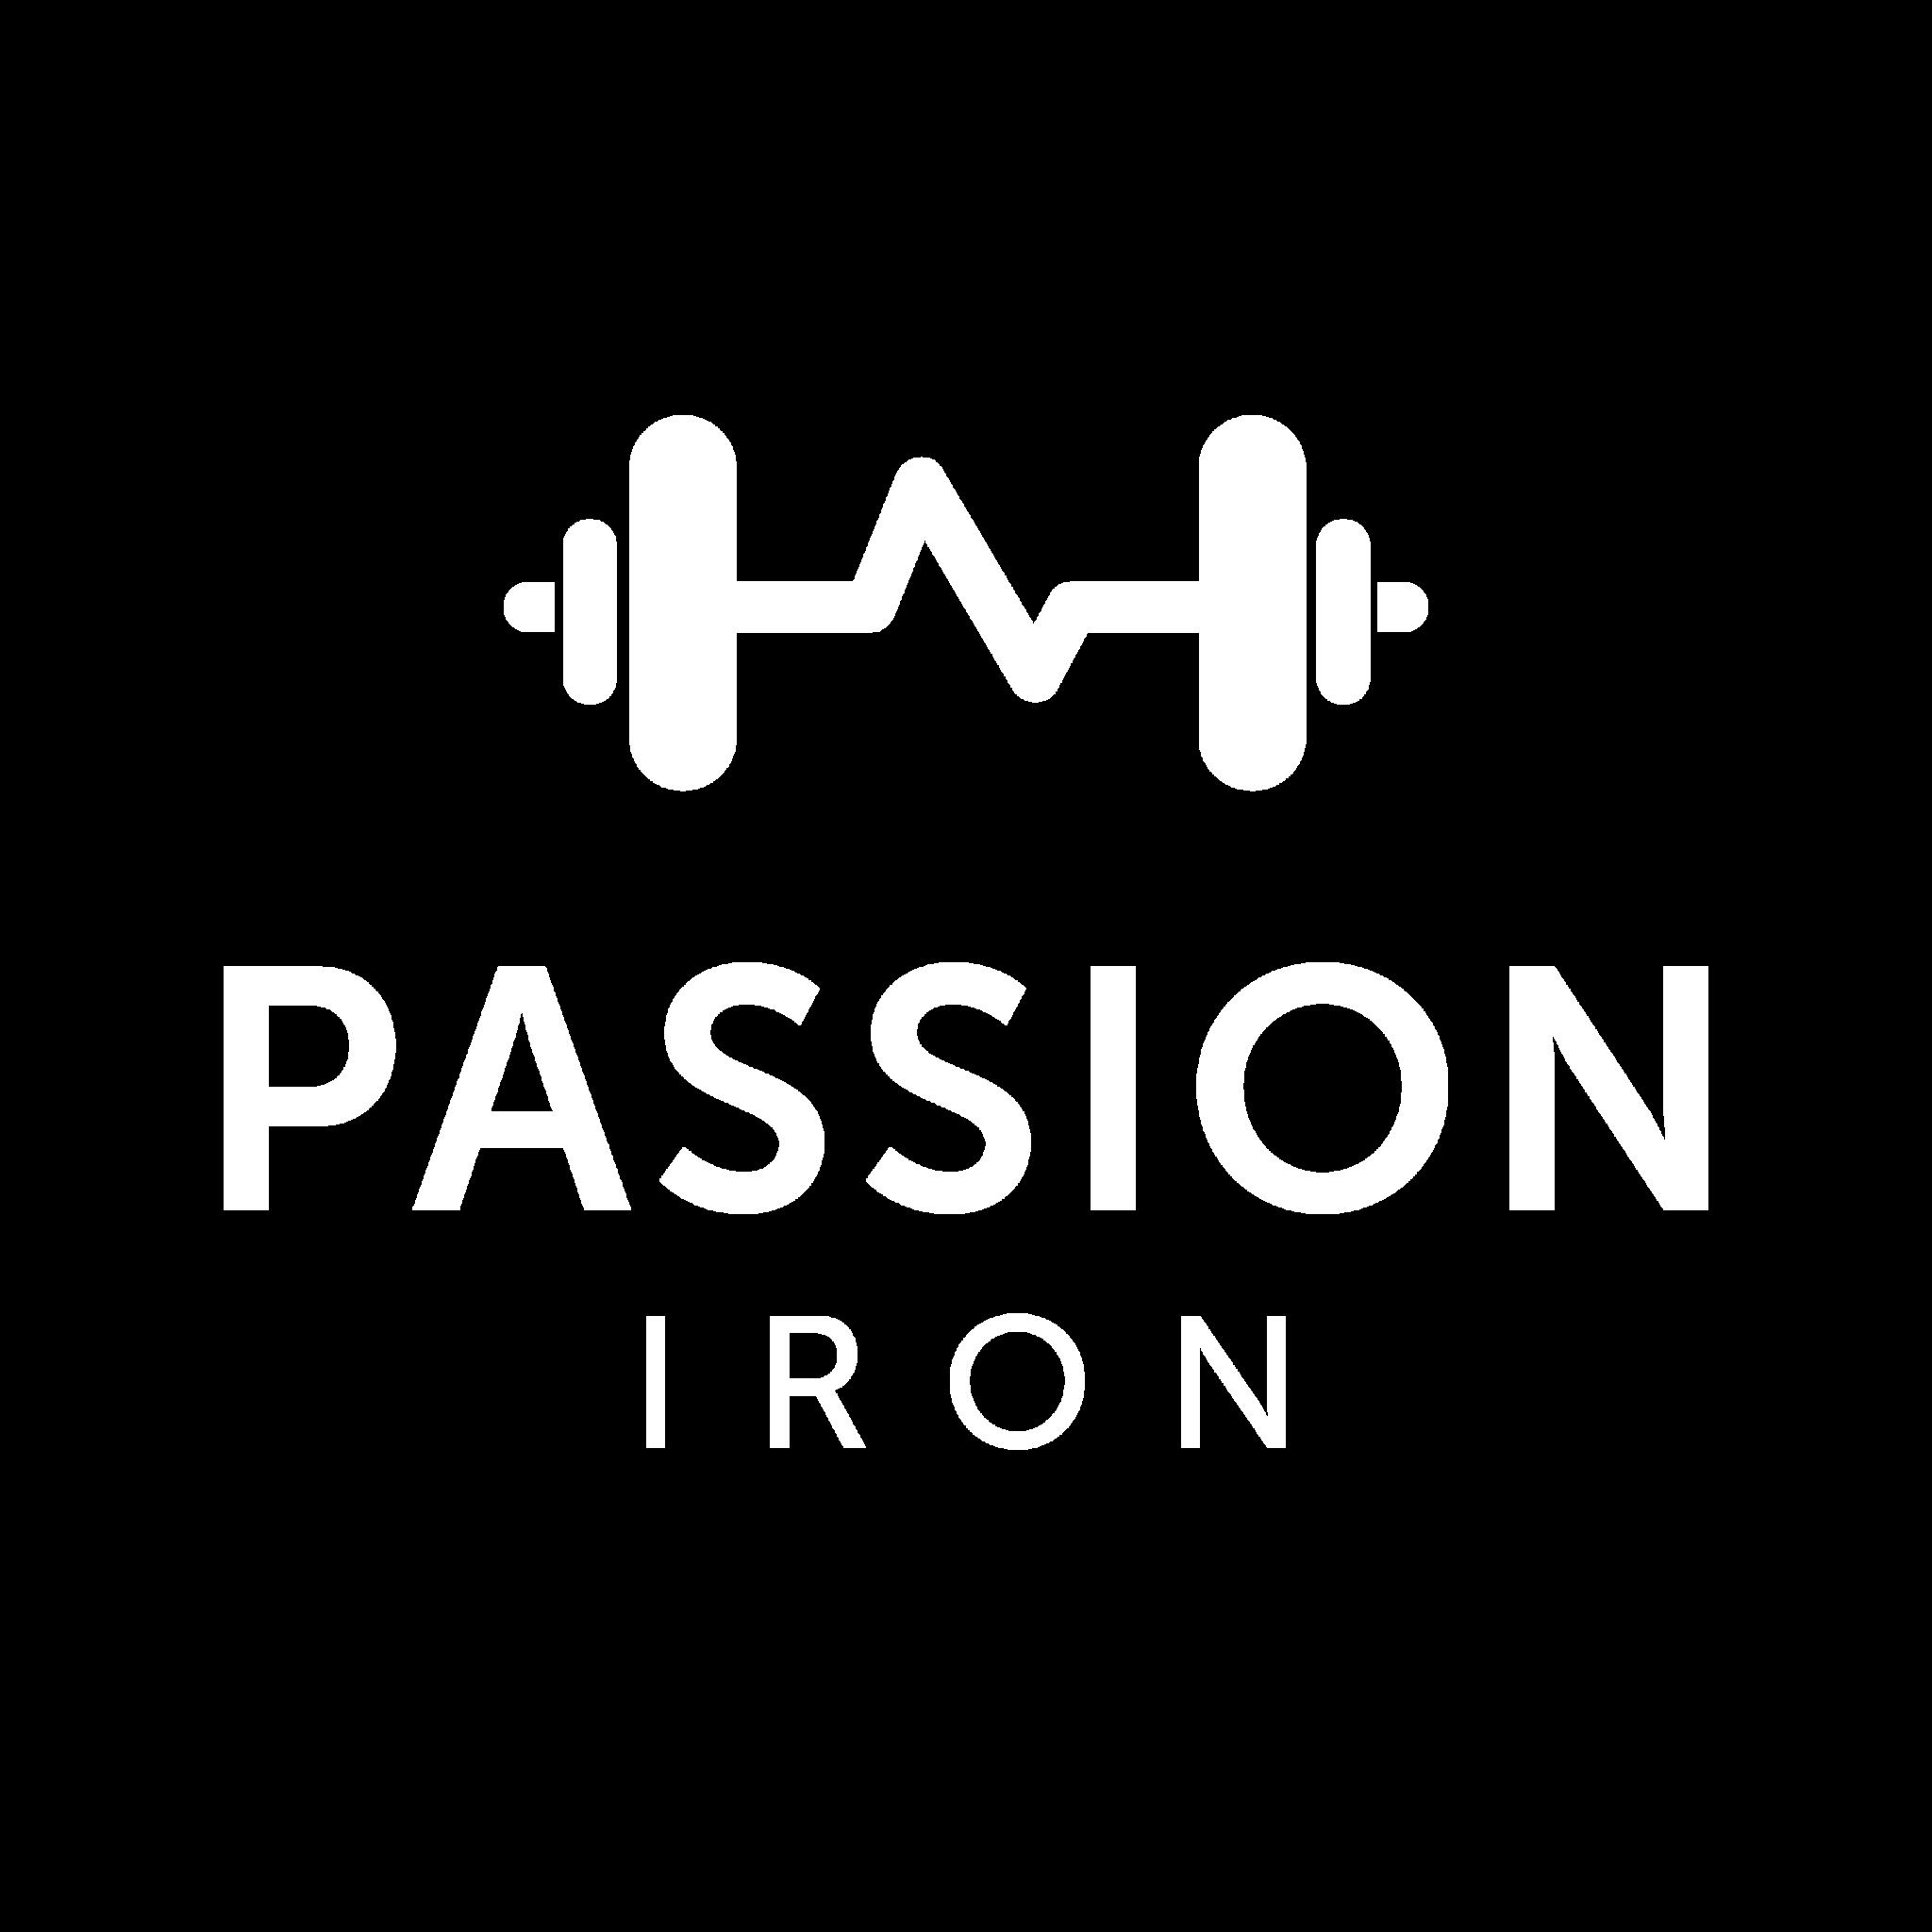 Passion Iron